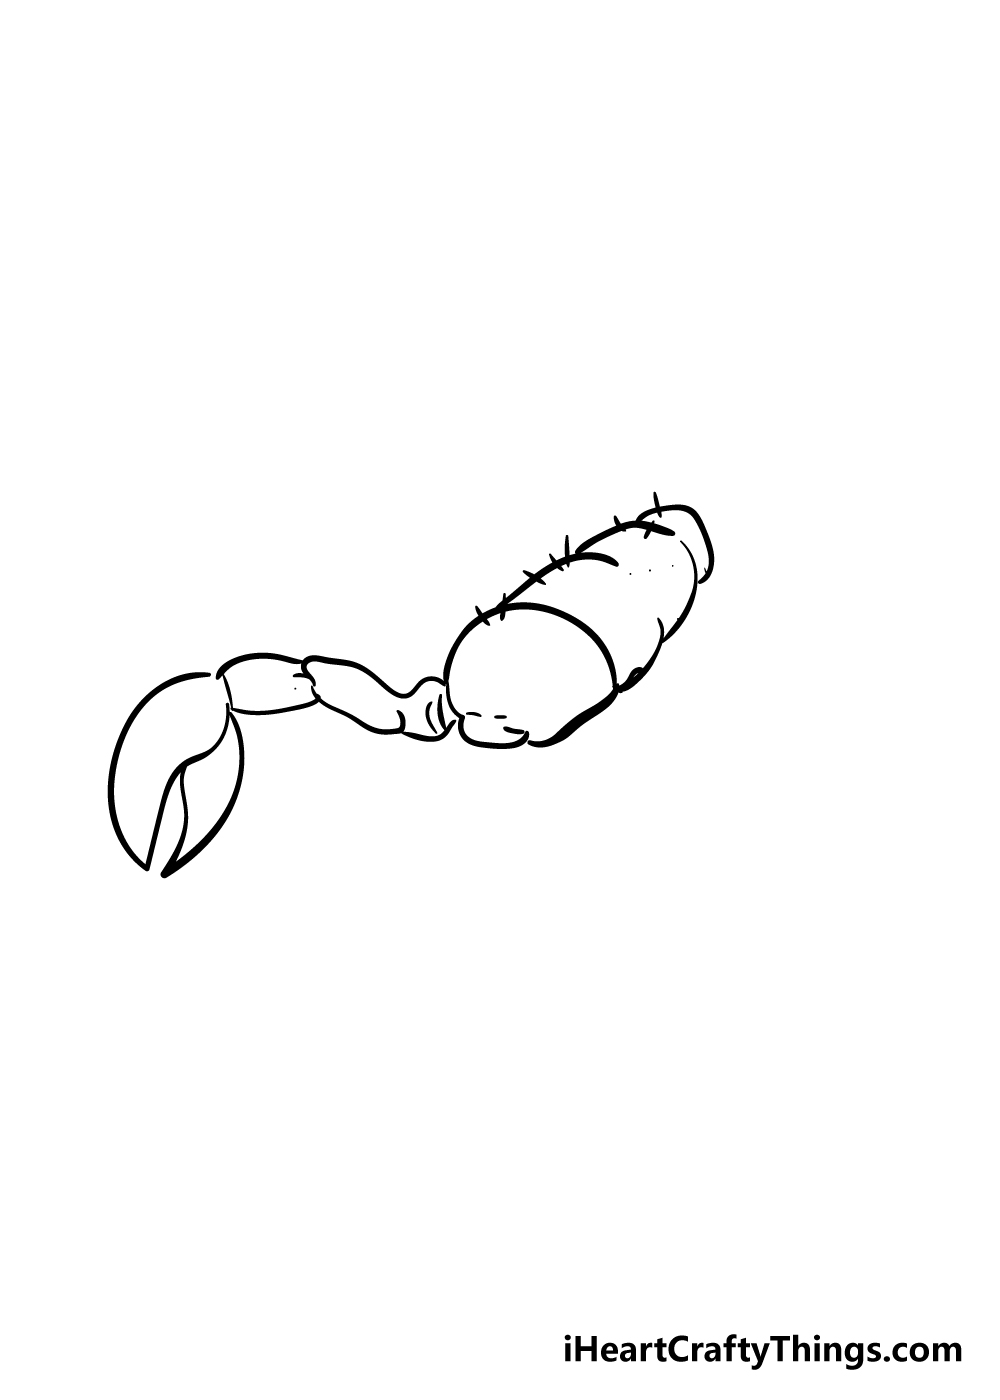 scorpion drawing step 2